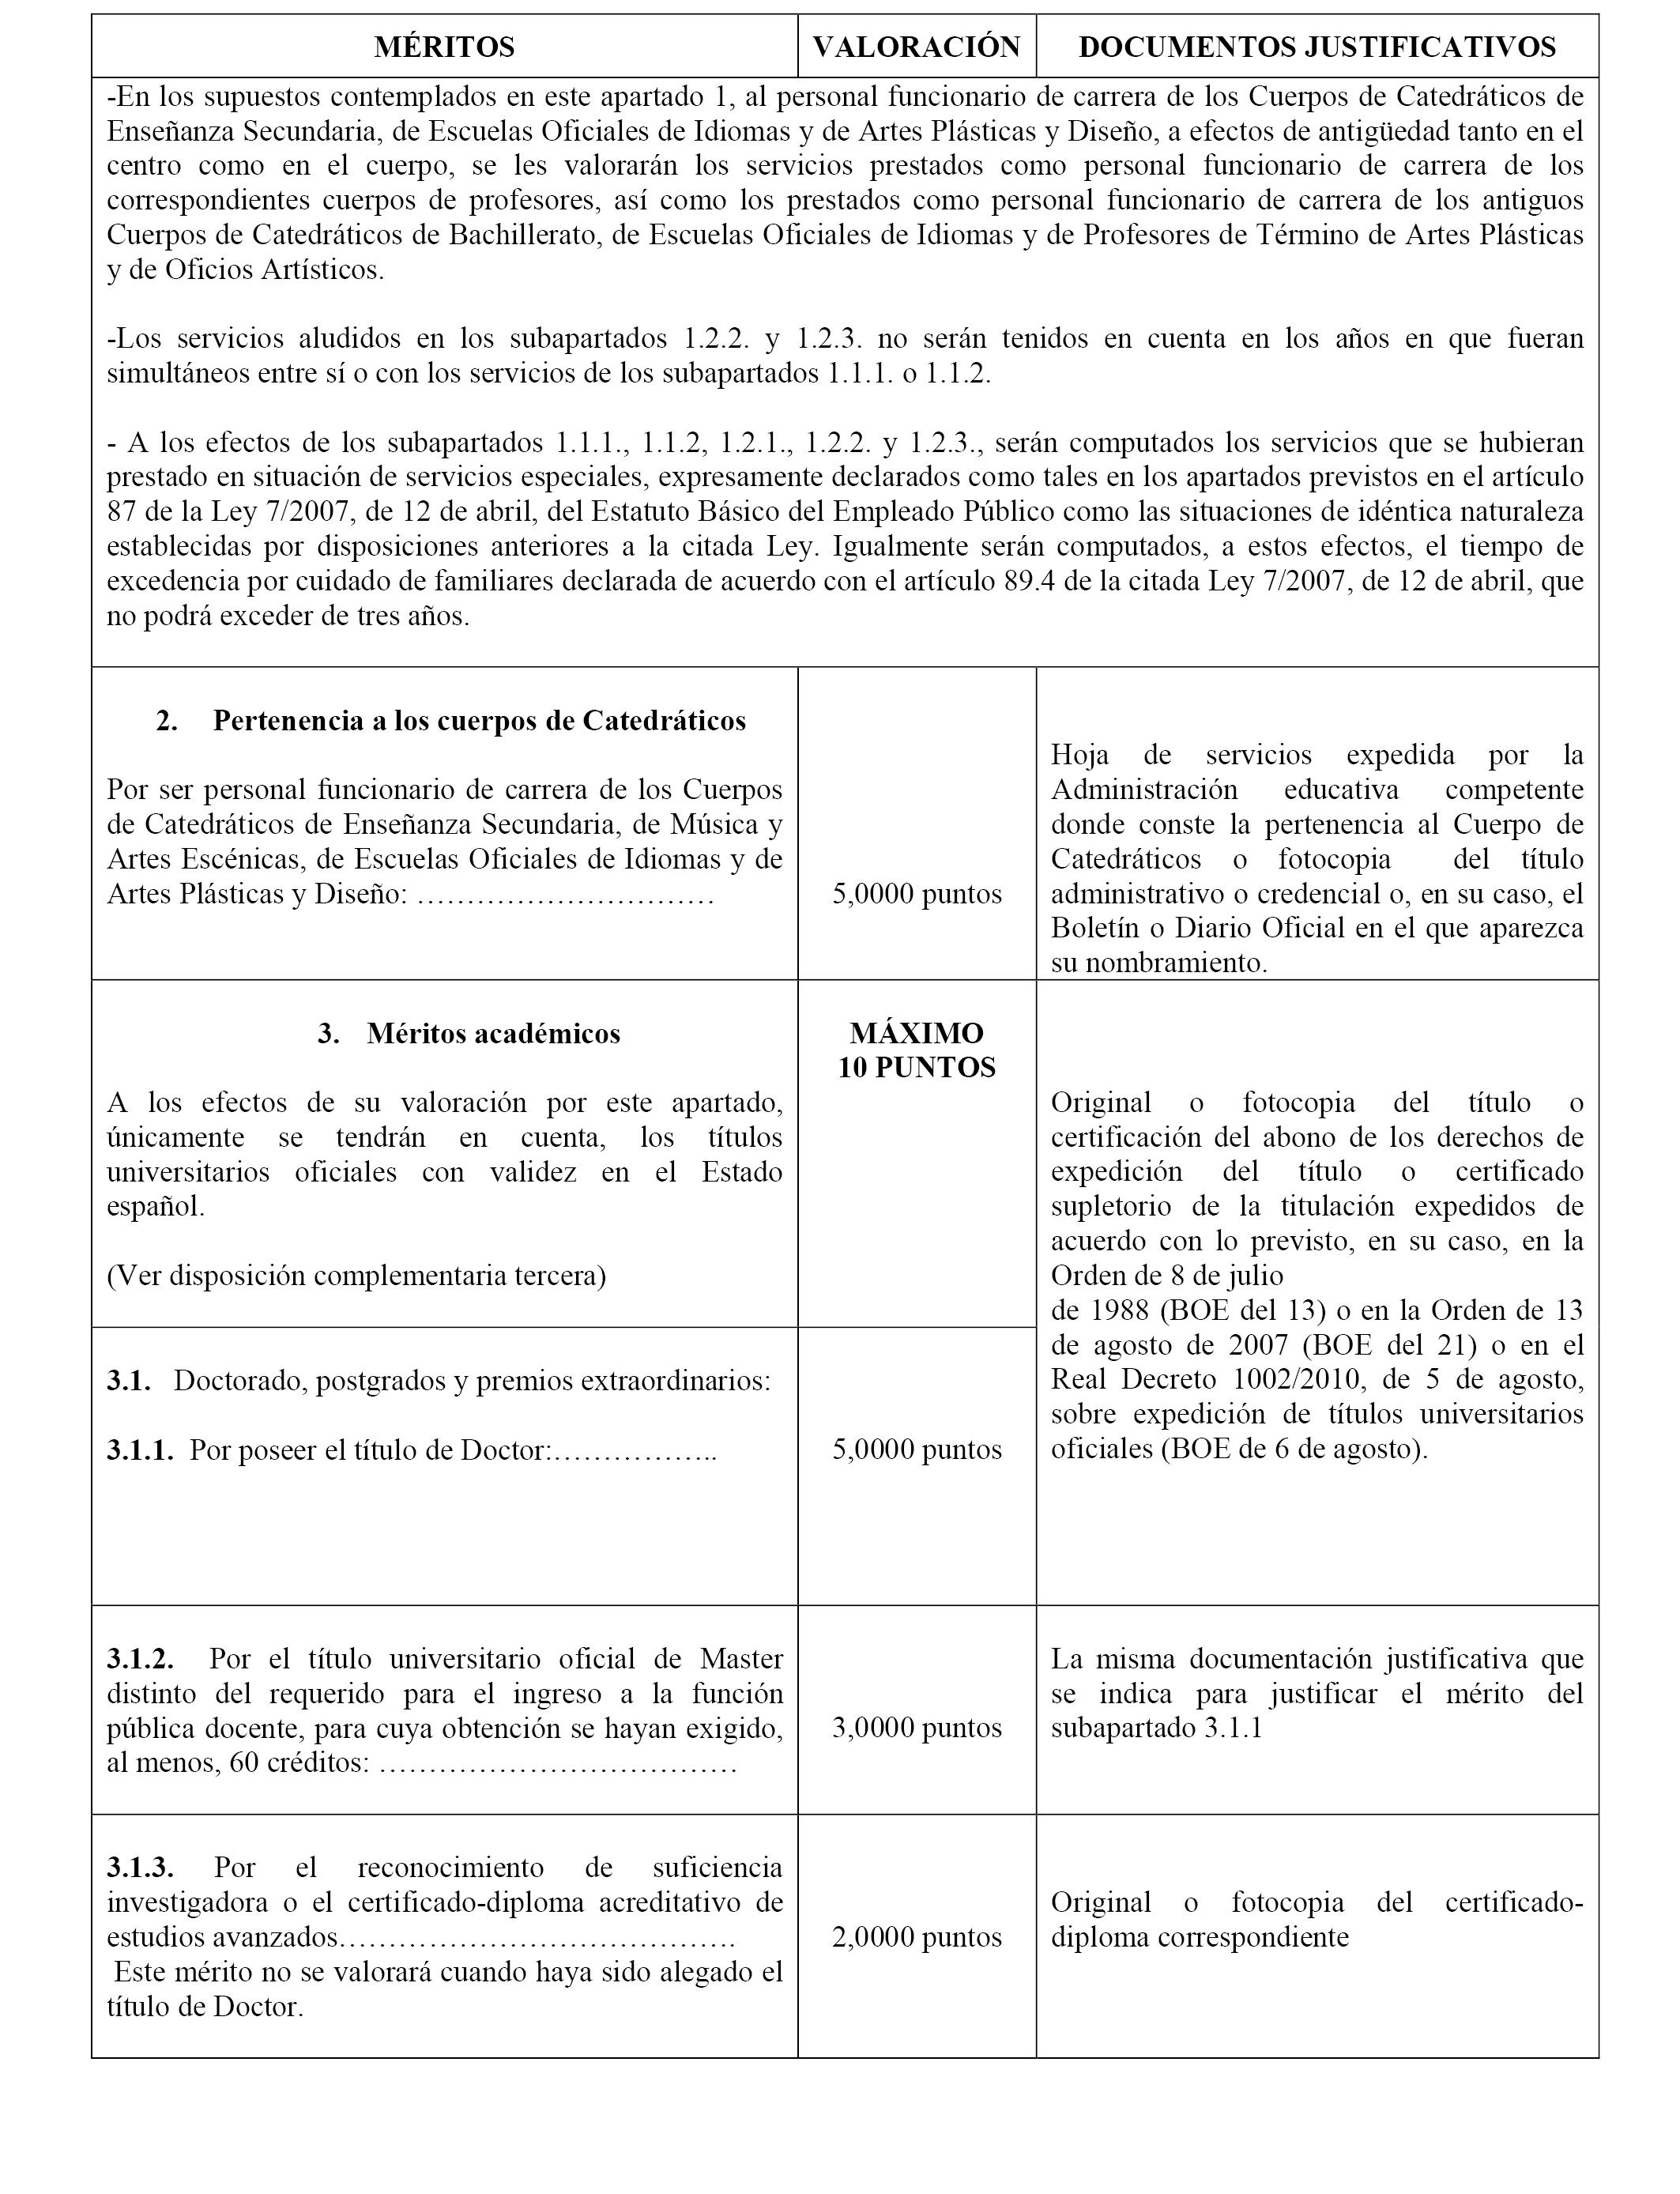 BOE.es - Documento BOE-A-2017-12573